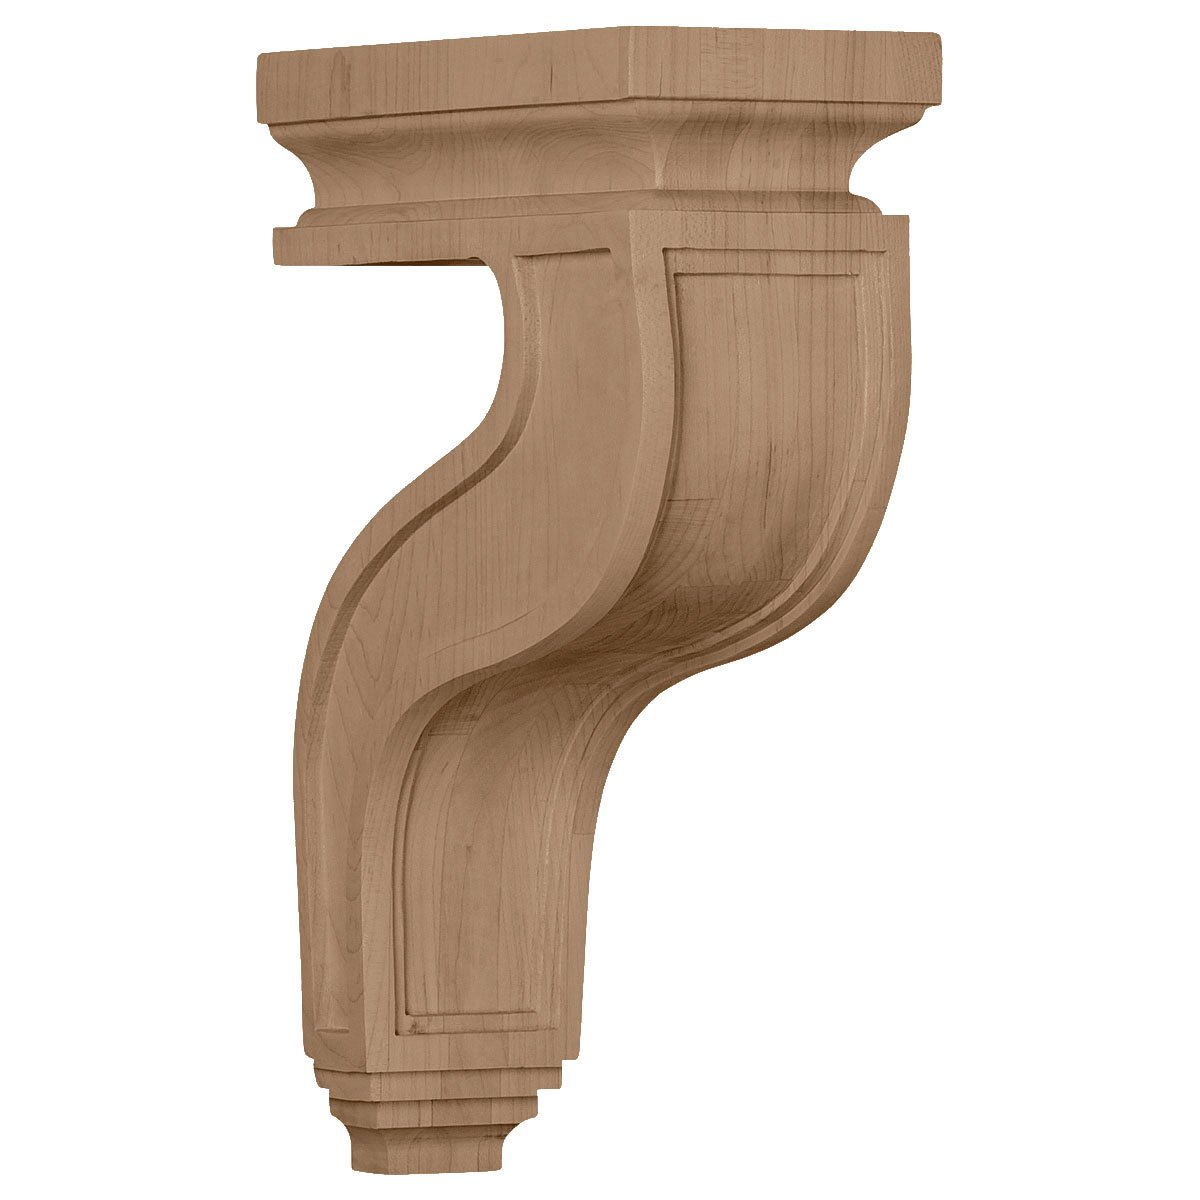 Ekena Millwork COR03X07X11HAMA 3 1//2-Inch W x 7 1//4-Inch D x 11-Inch H Hollow Back Corbel Maple